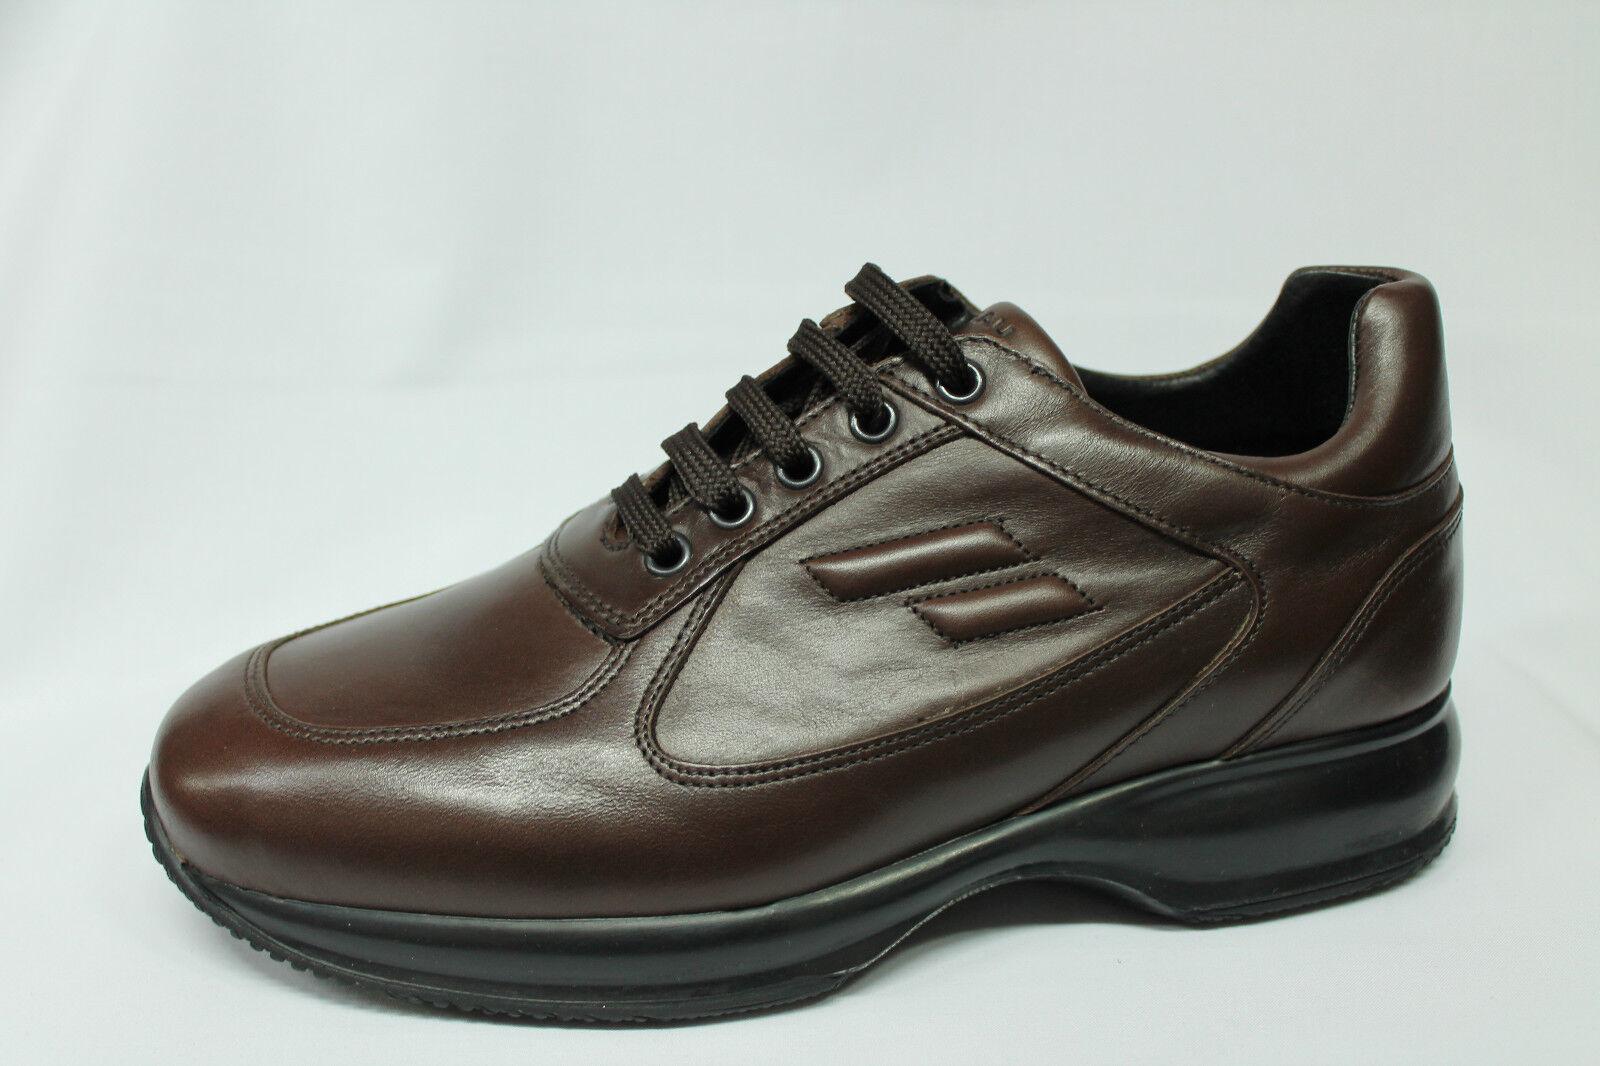 Sneakers moro Frau 24P3 testa di moro Sneakers tipo Hogan Made in Italy listino135 - 20% ee2588